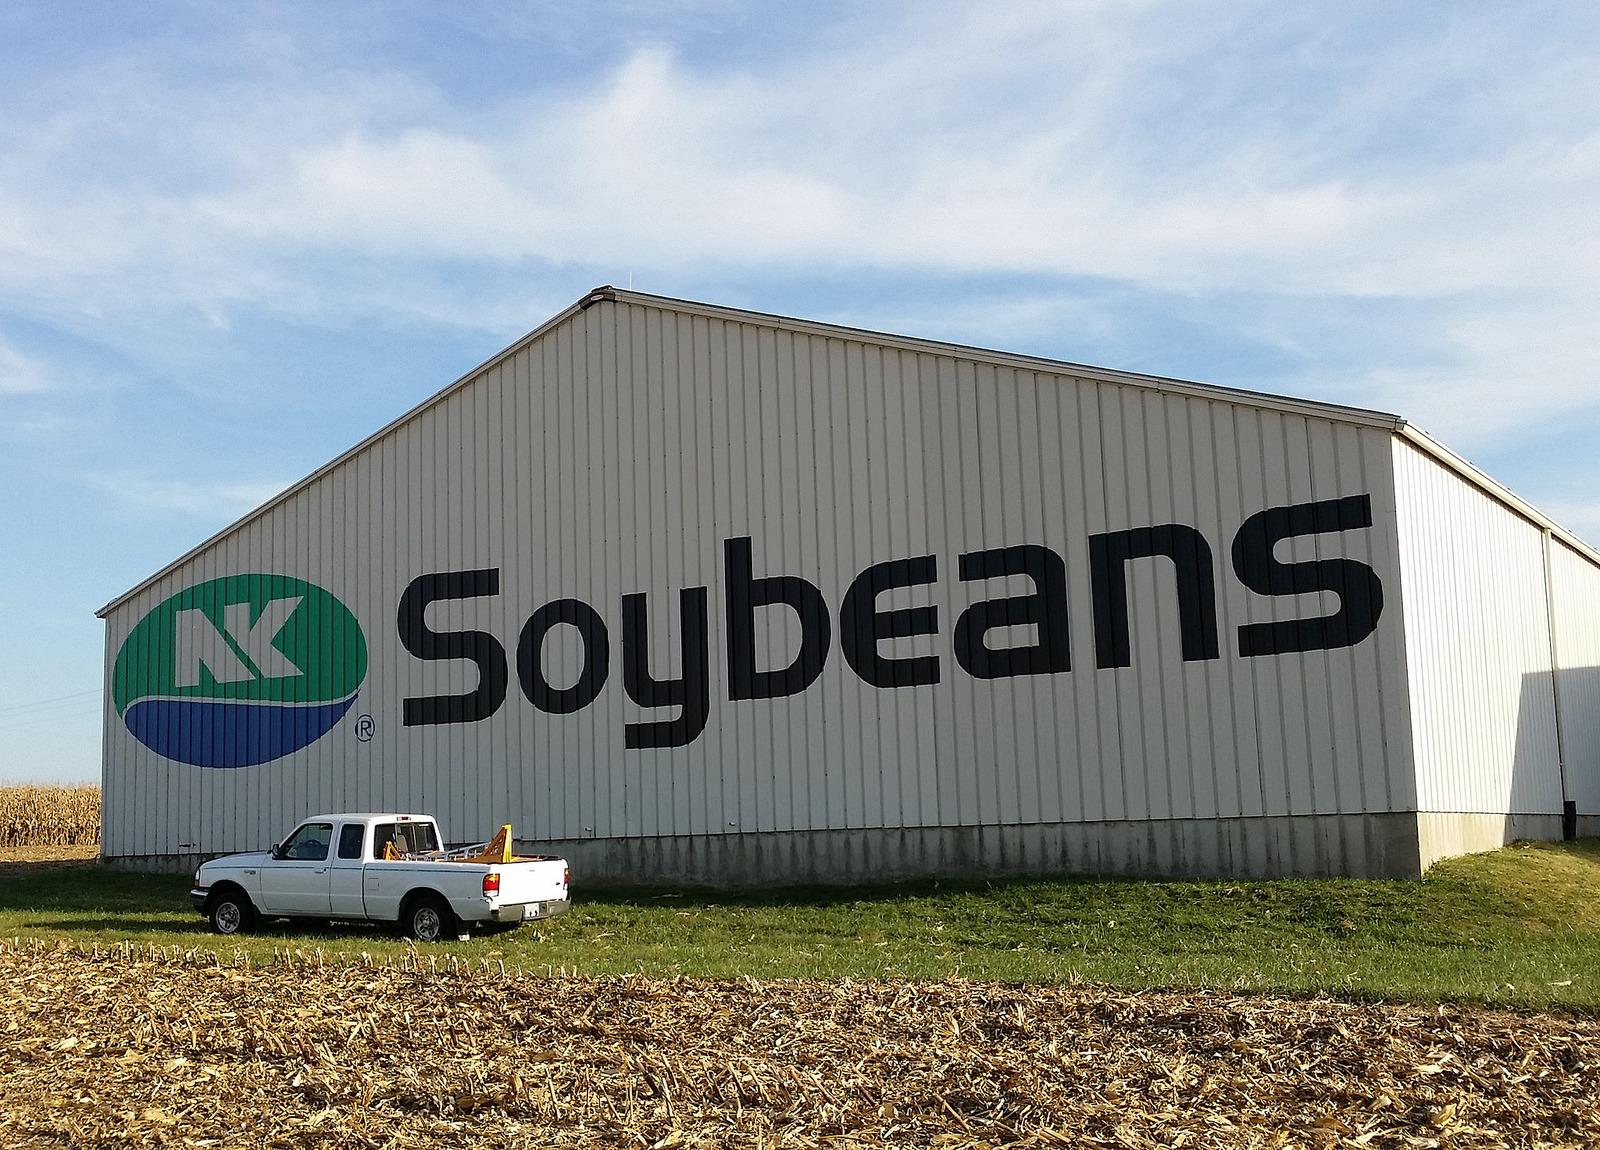 NK Soybean logo painting on barn